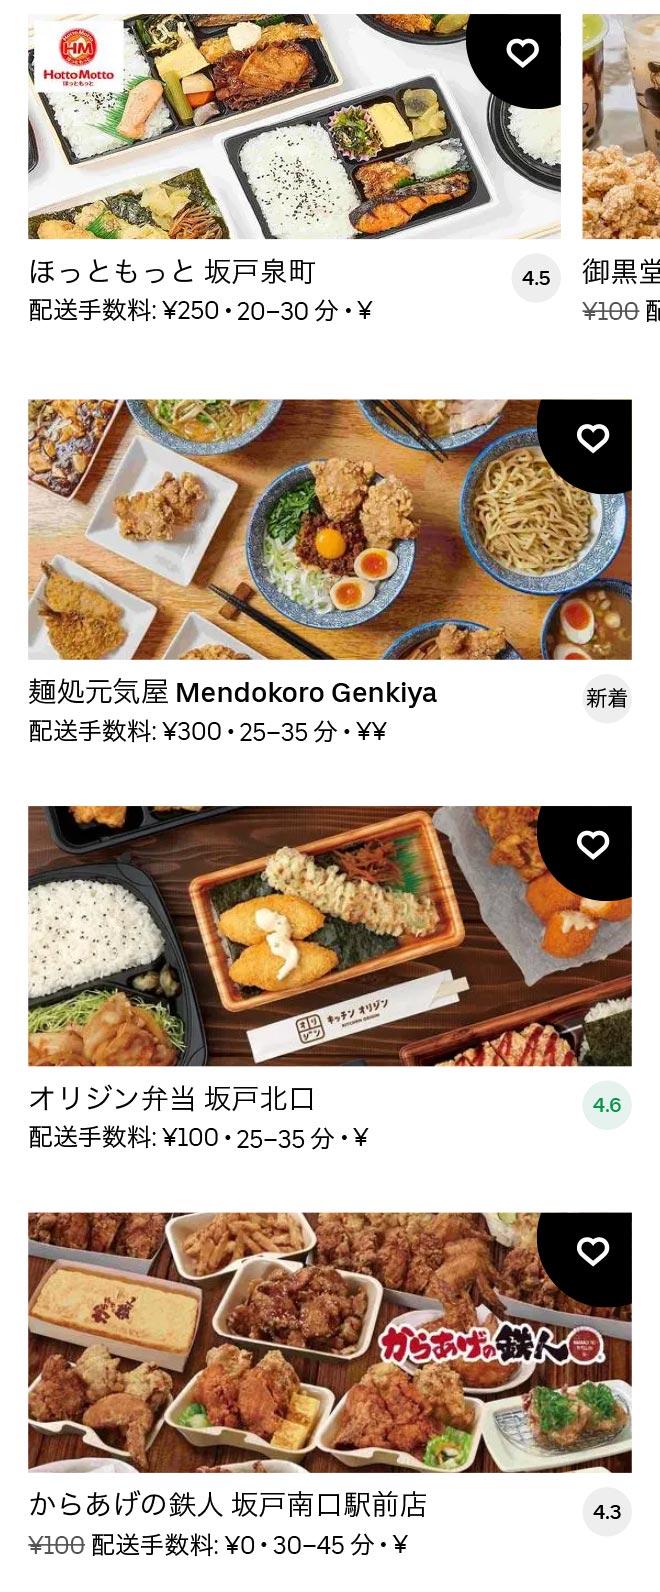 Sakado menu 2101 02